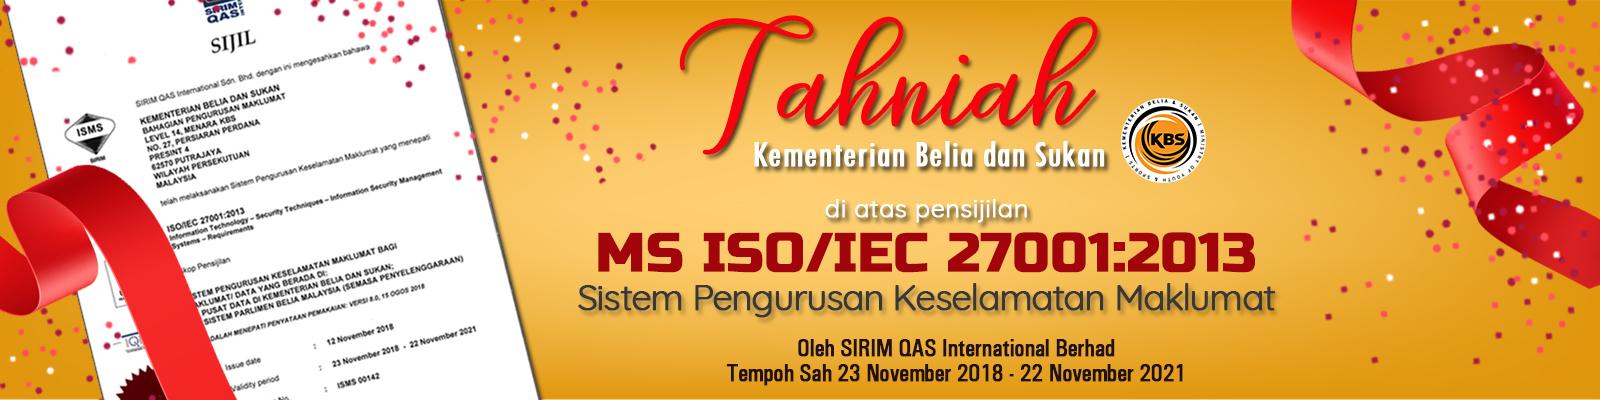 tahniah_pensijilan_isms_portal.jpg